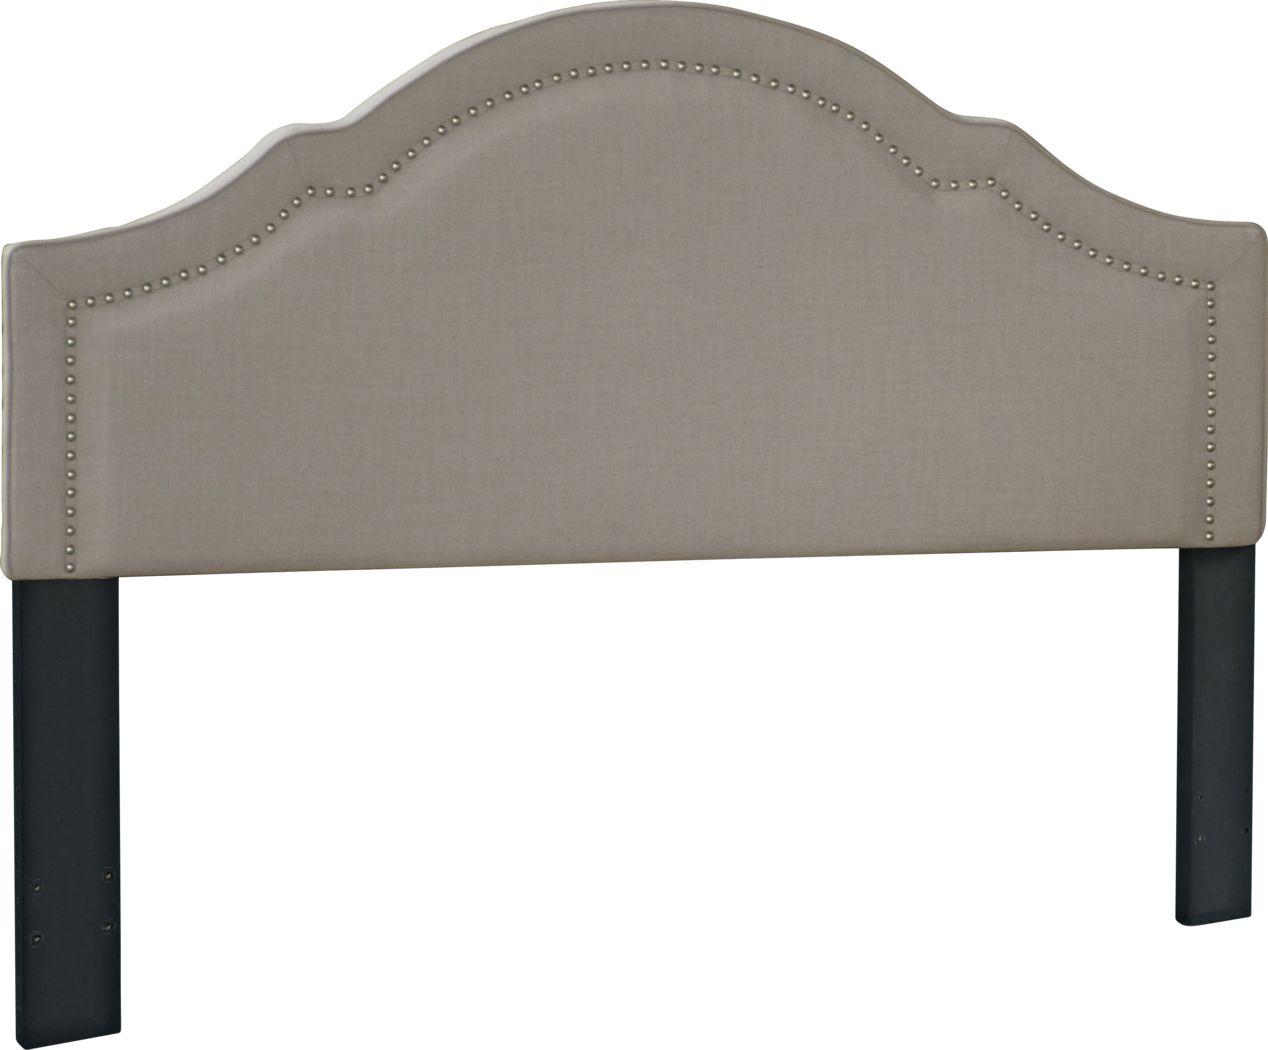 Seldalia Gray King Upholstered Headboard